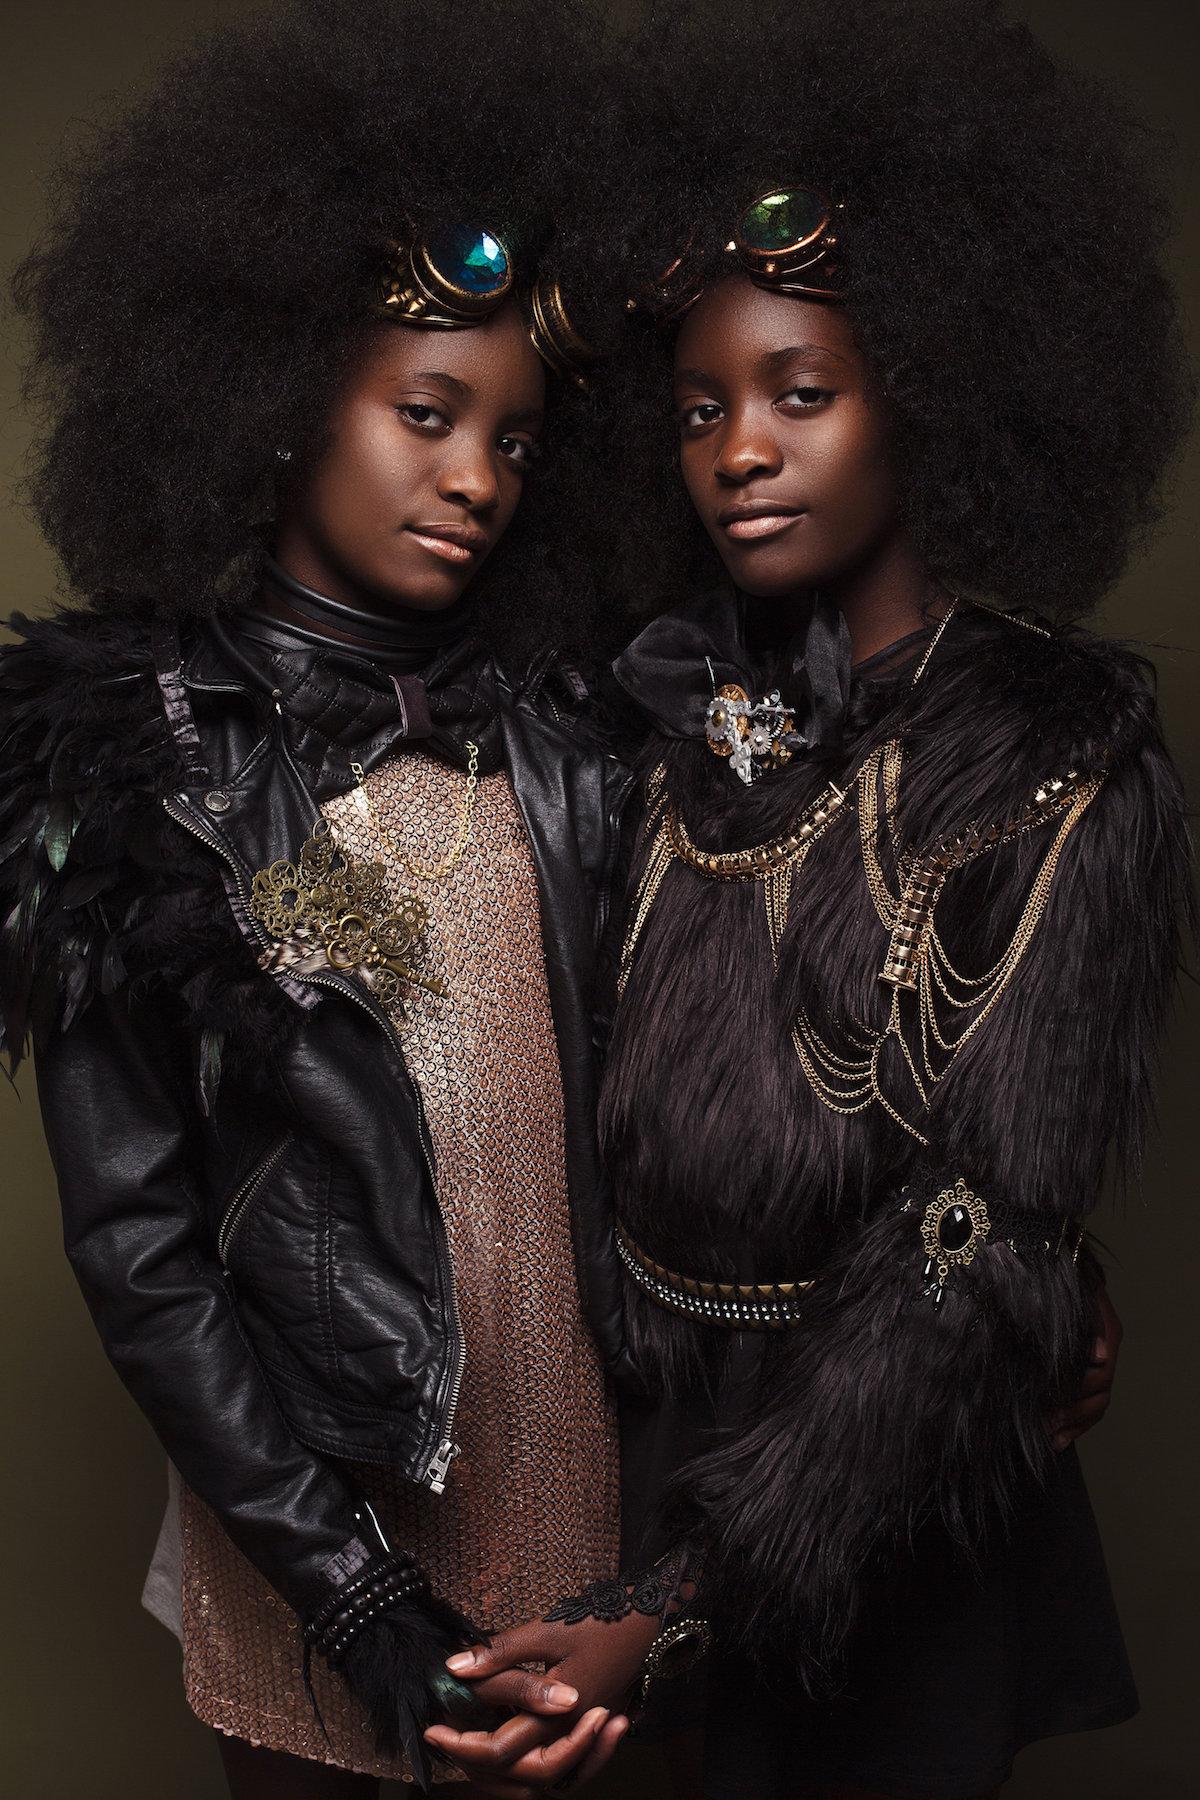 Afro-art-creative-soul-photography-4.jpg